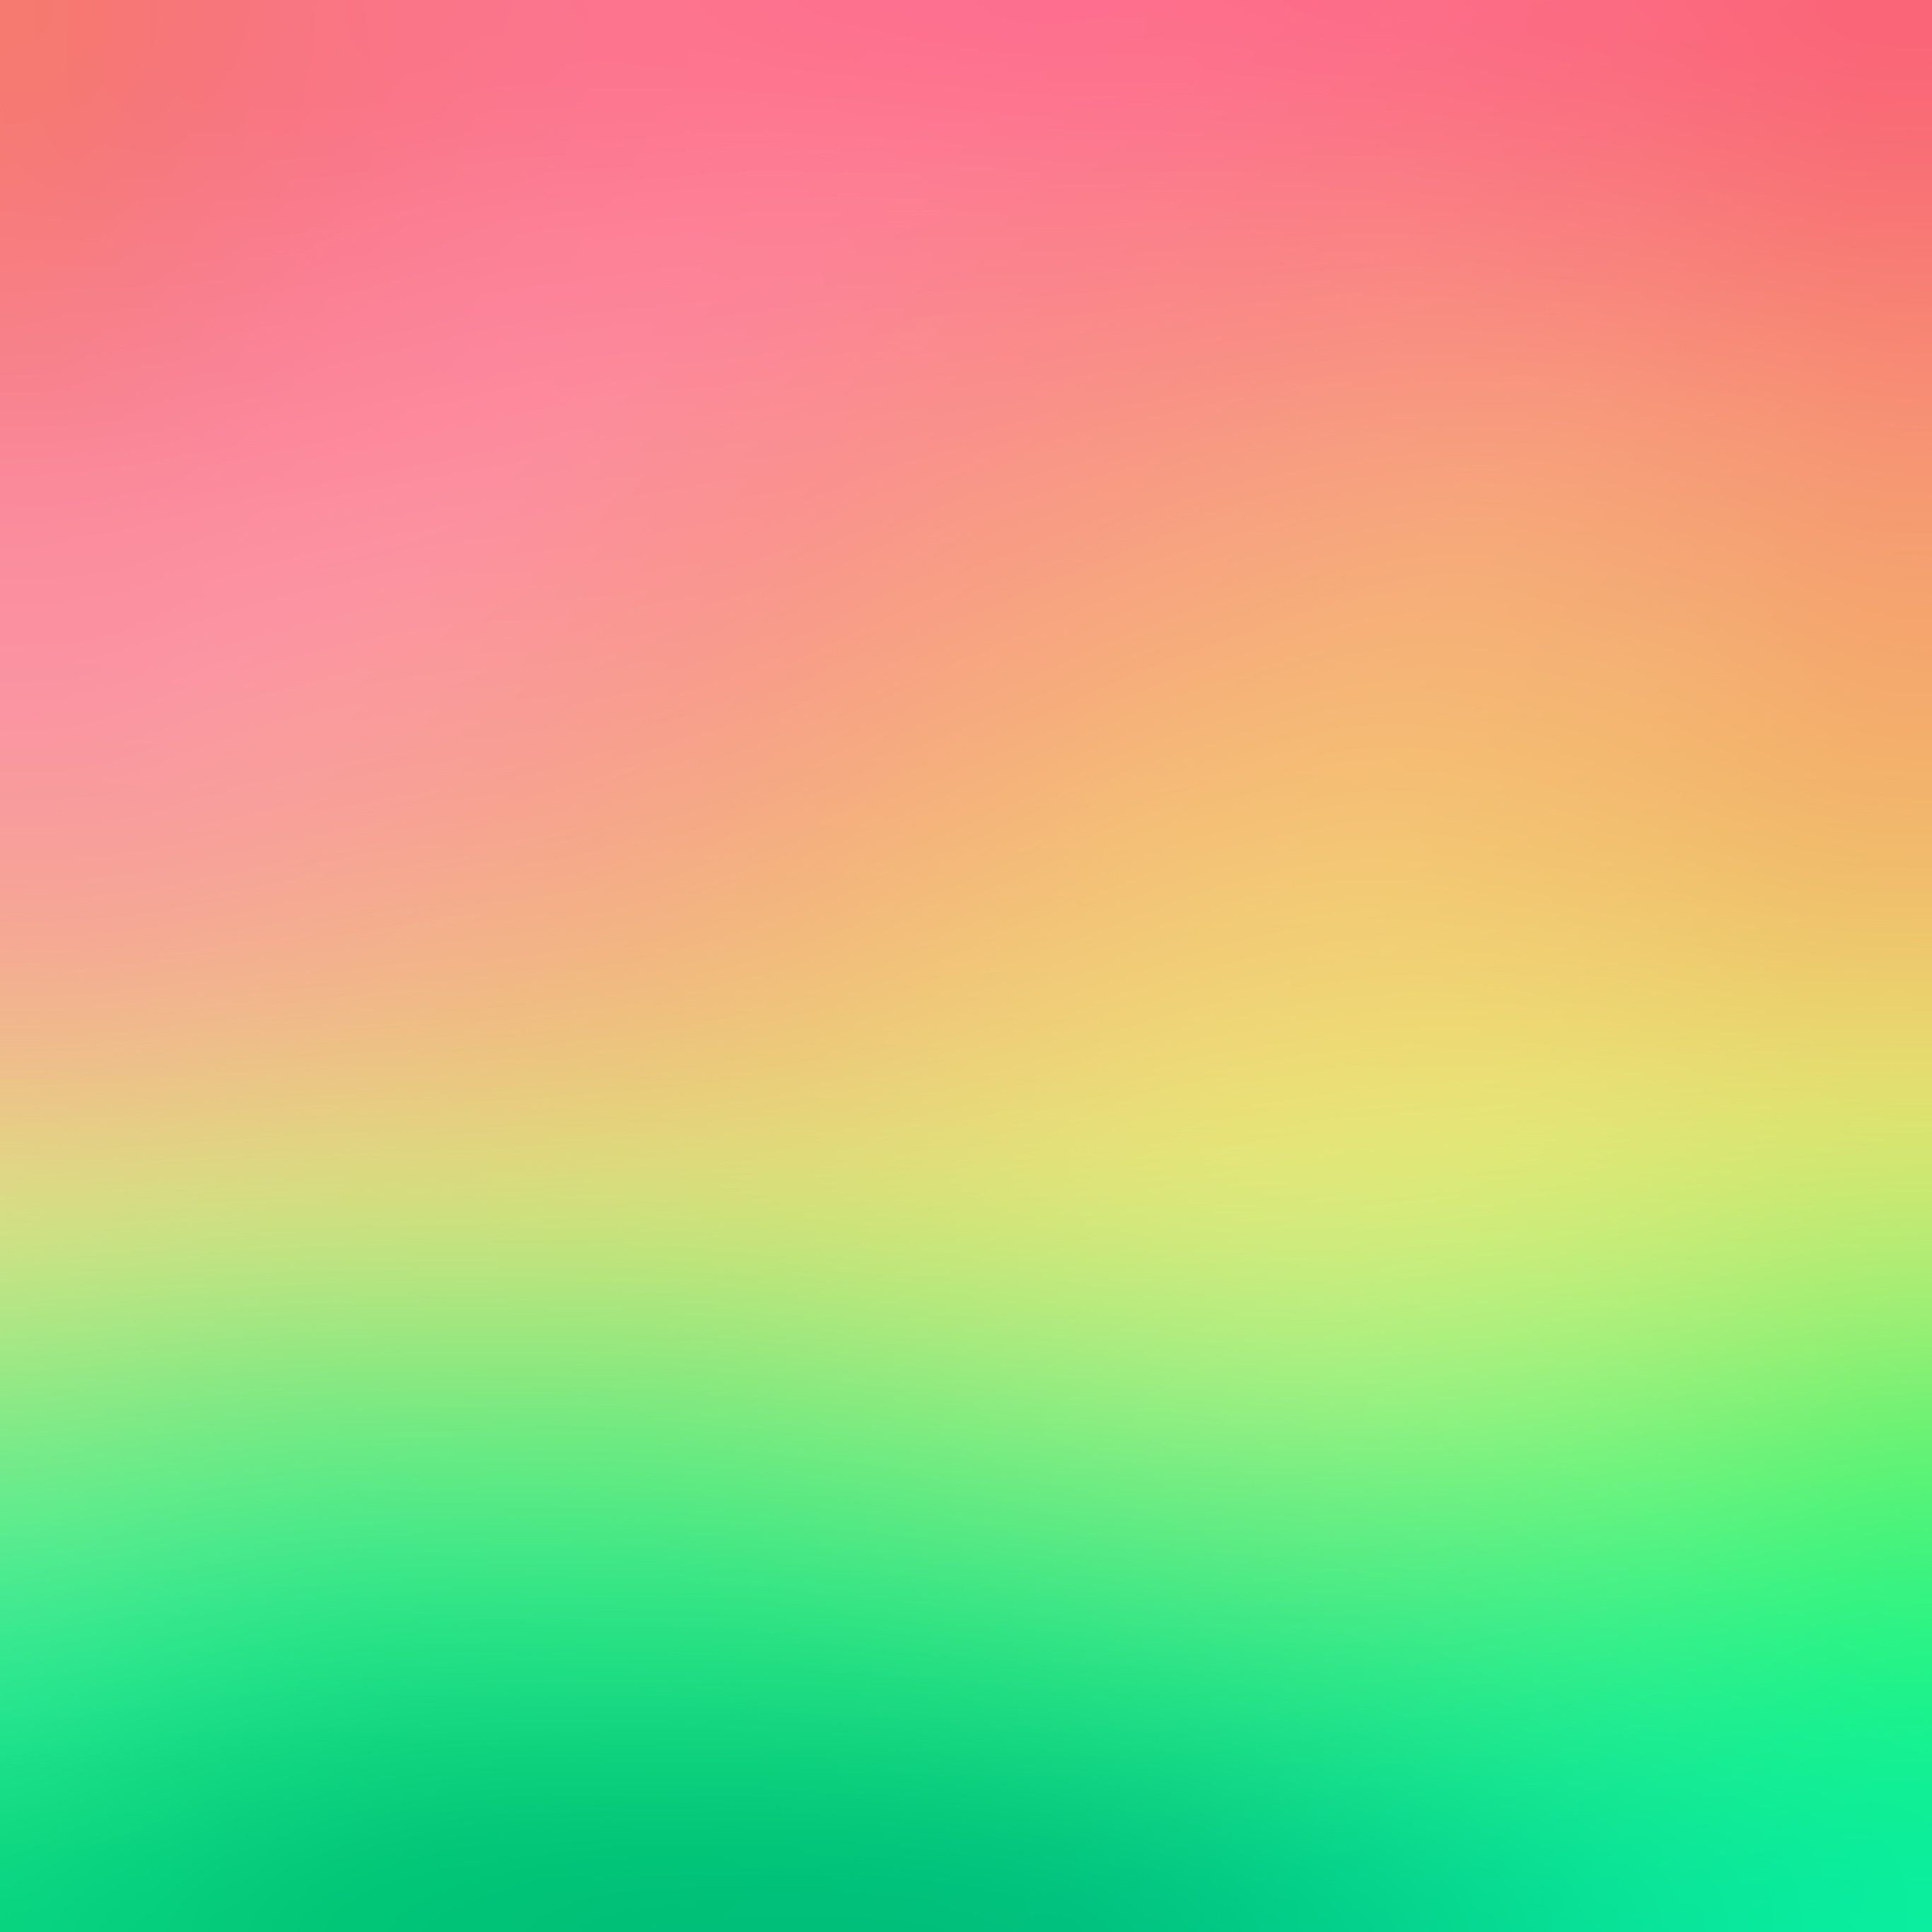 Sf96-rainbow-red-yellow